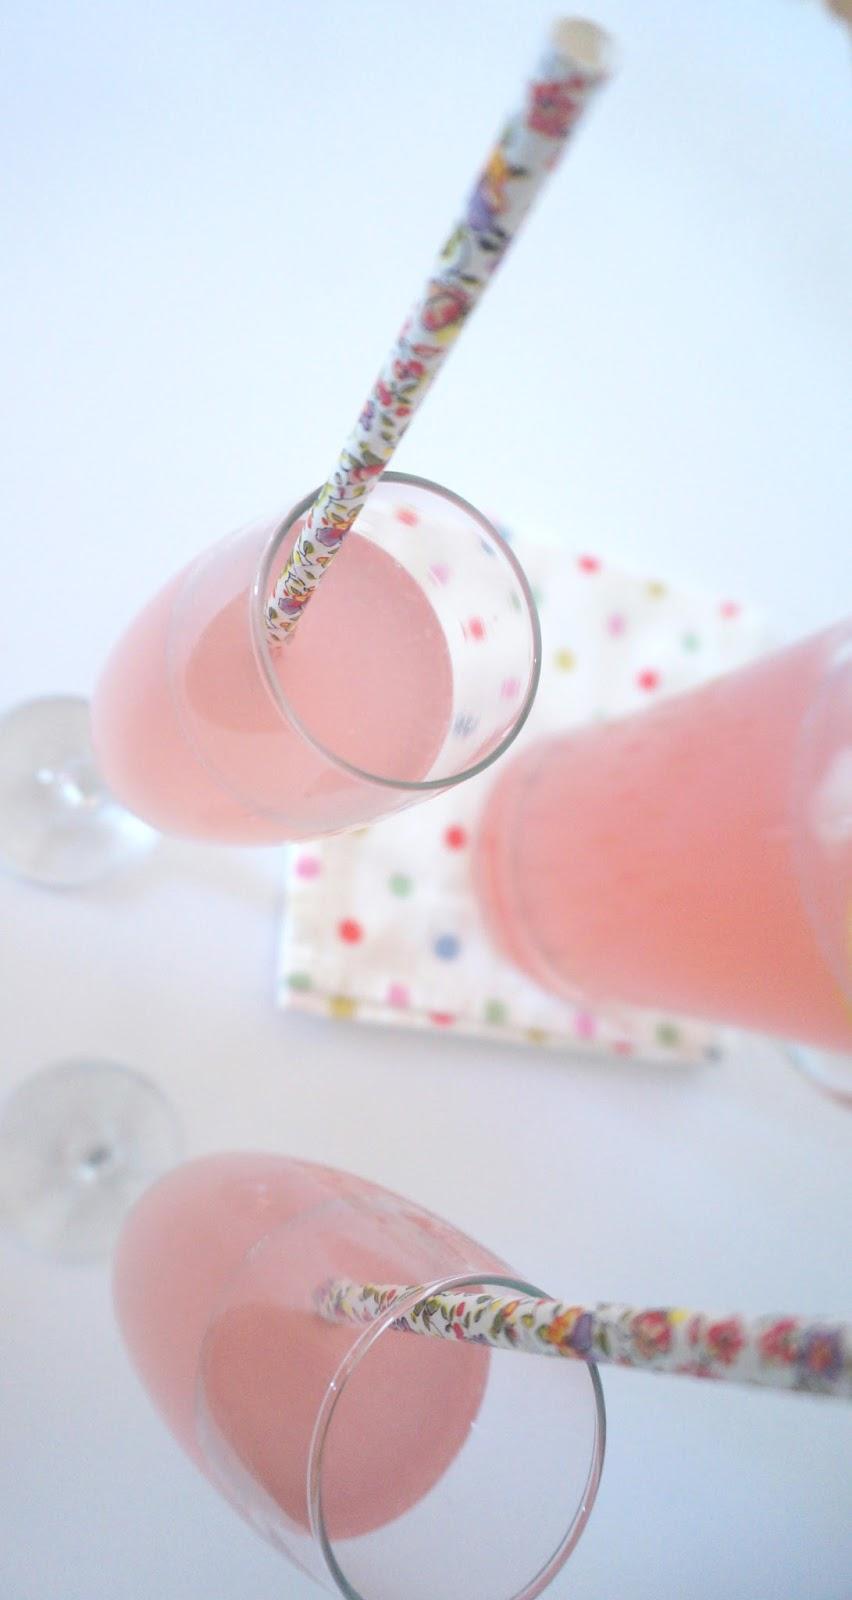 meg-made: Homemade Pink Lemonade recipe